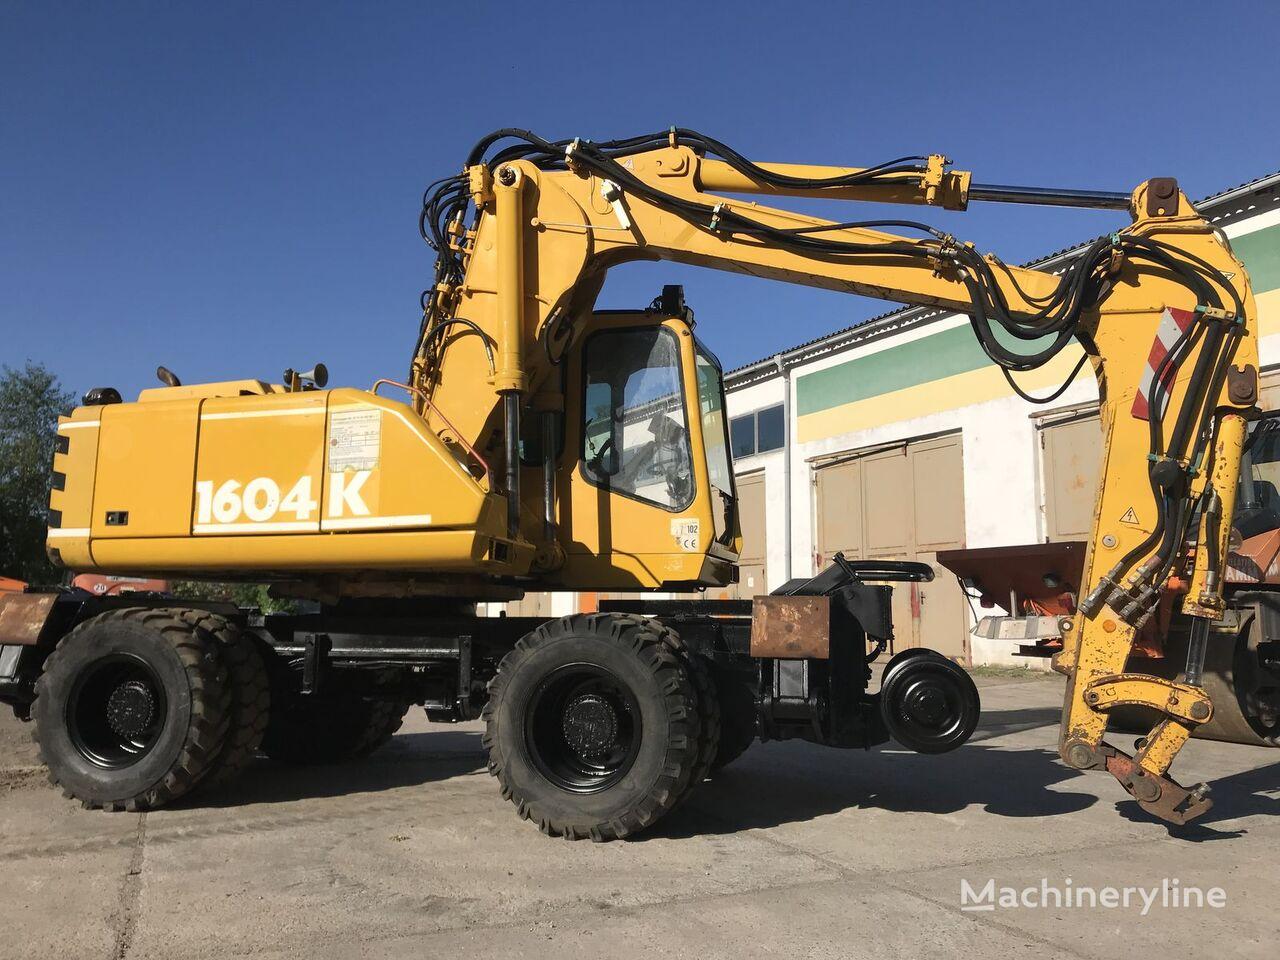 ATLAS 1604 K  rail excavator